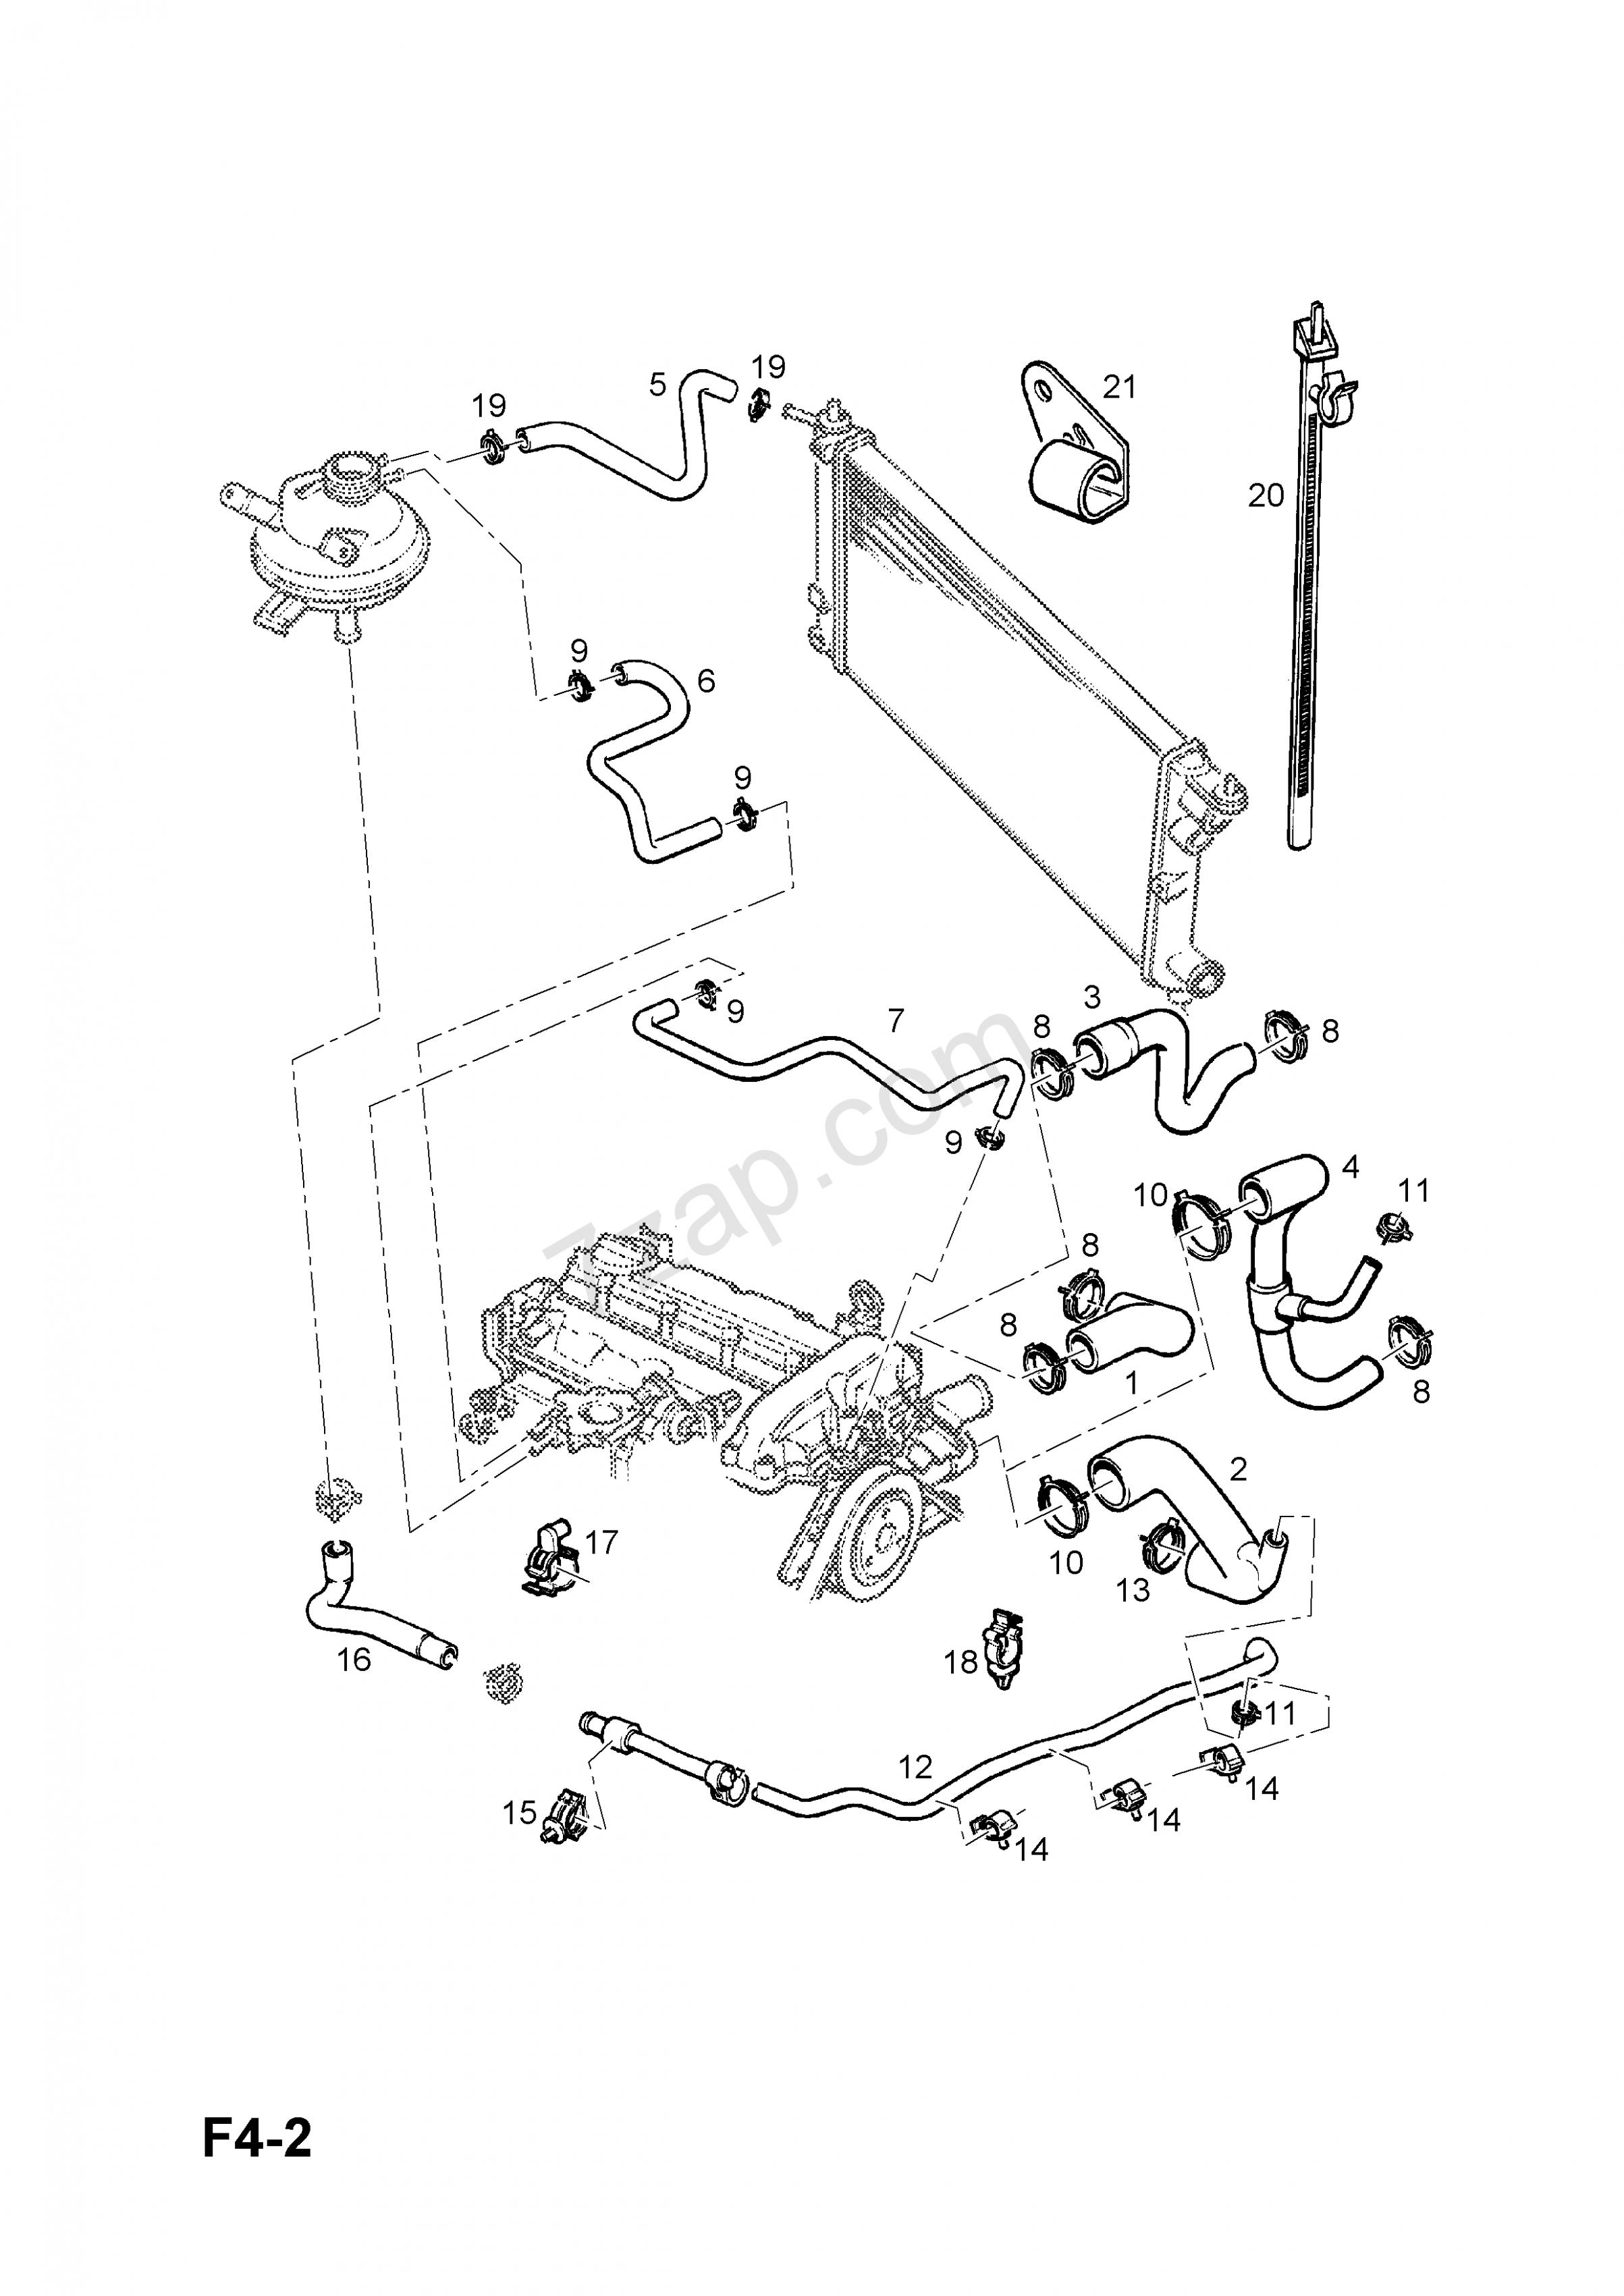 Opel Corsa Lite Engine Diagram Jakarta di 2020